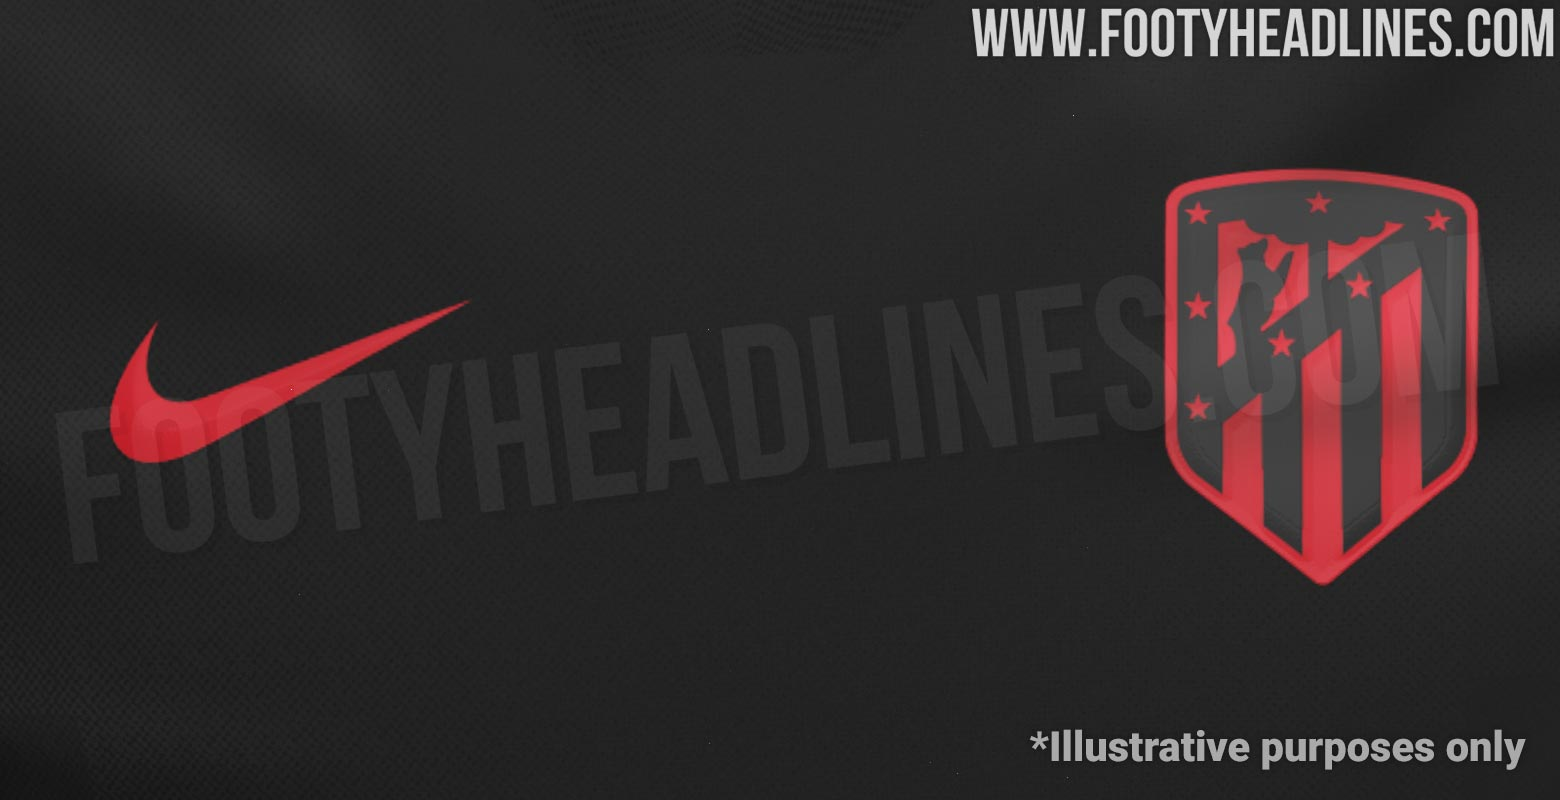 039b649a7 No AdsExclusive ContentCustomize Content MixExclusive Vouchers. Next  season s Nike soccer jerseys collection ...